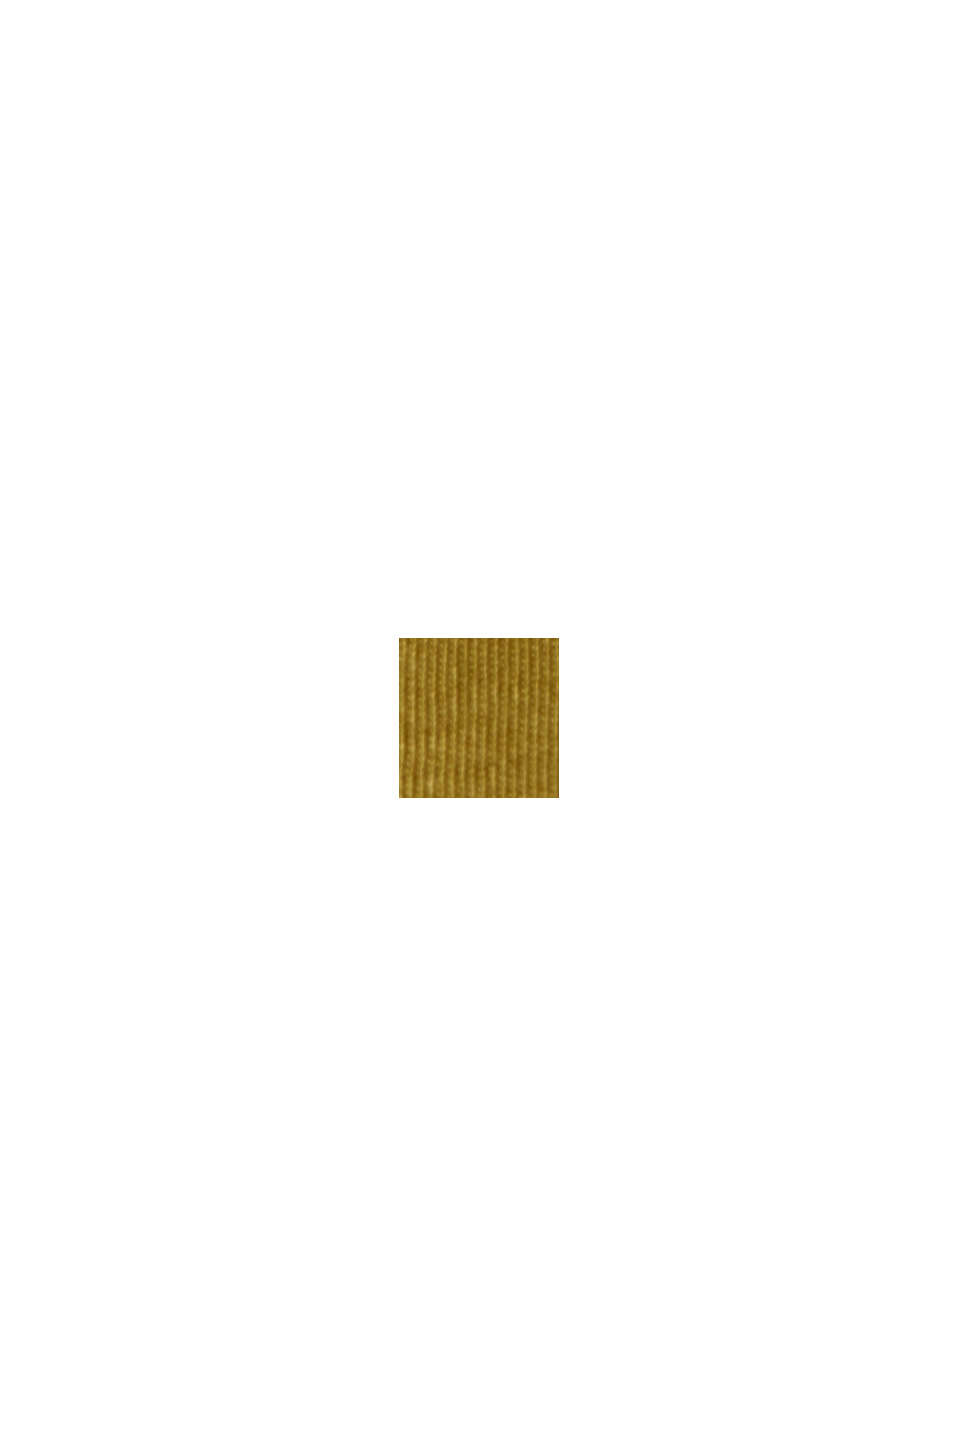 Van TENCEL™ lyocell: top met laag uitgesneden rug, OLIVE, swatch